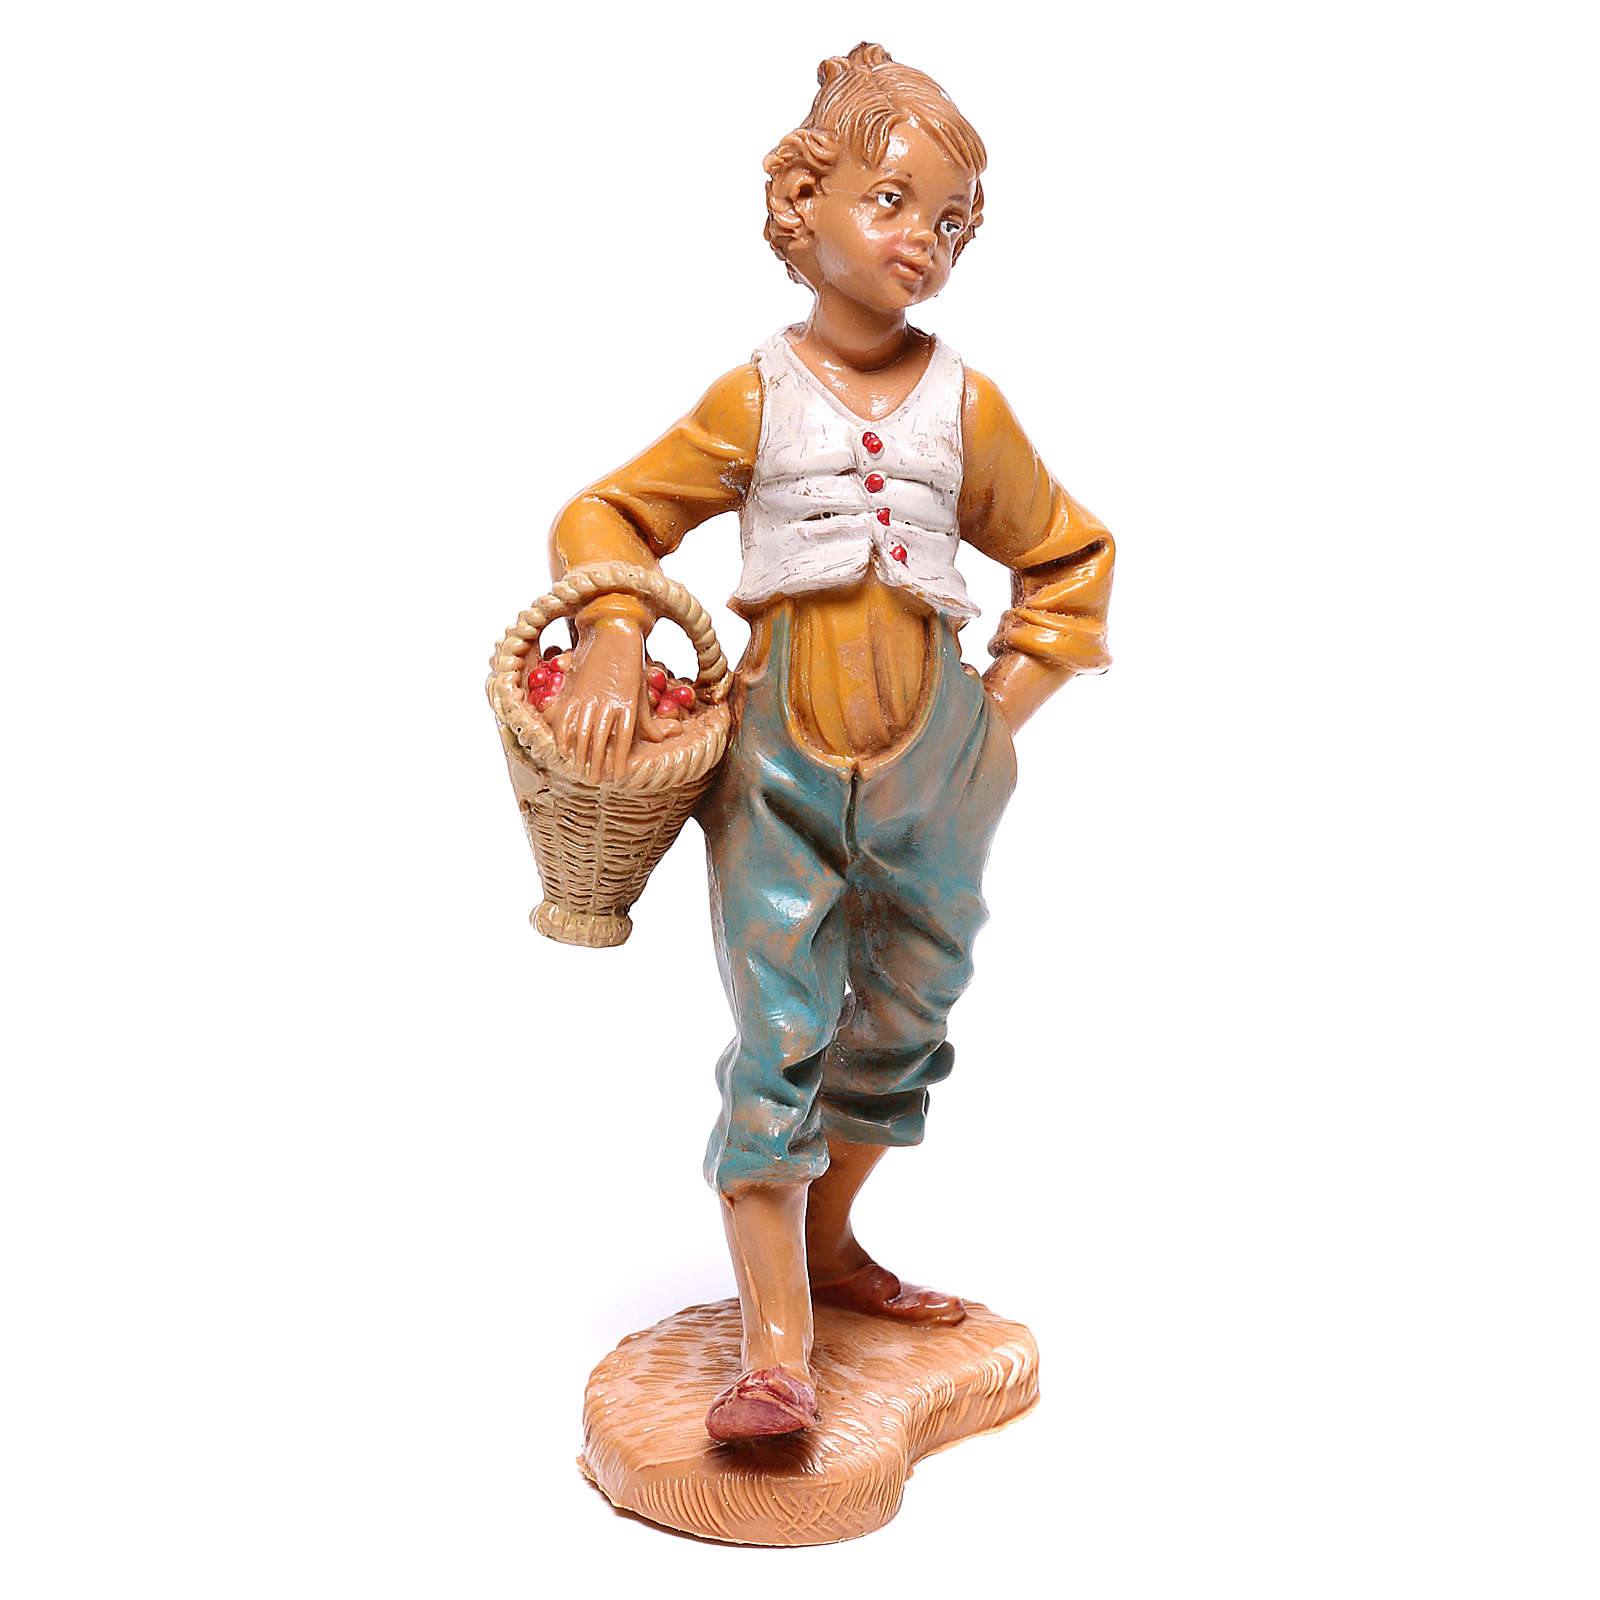 Chico con cesta de fruta belén Fontanini 10 cm 4